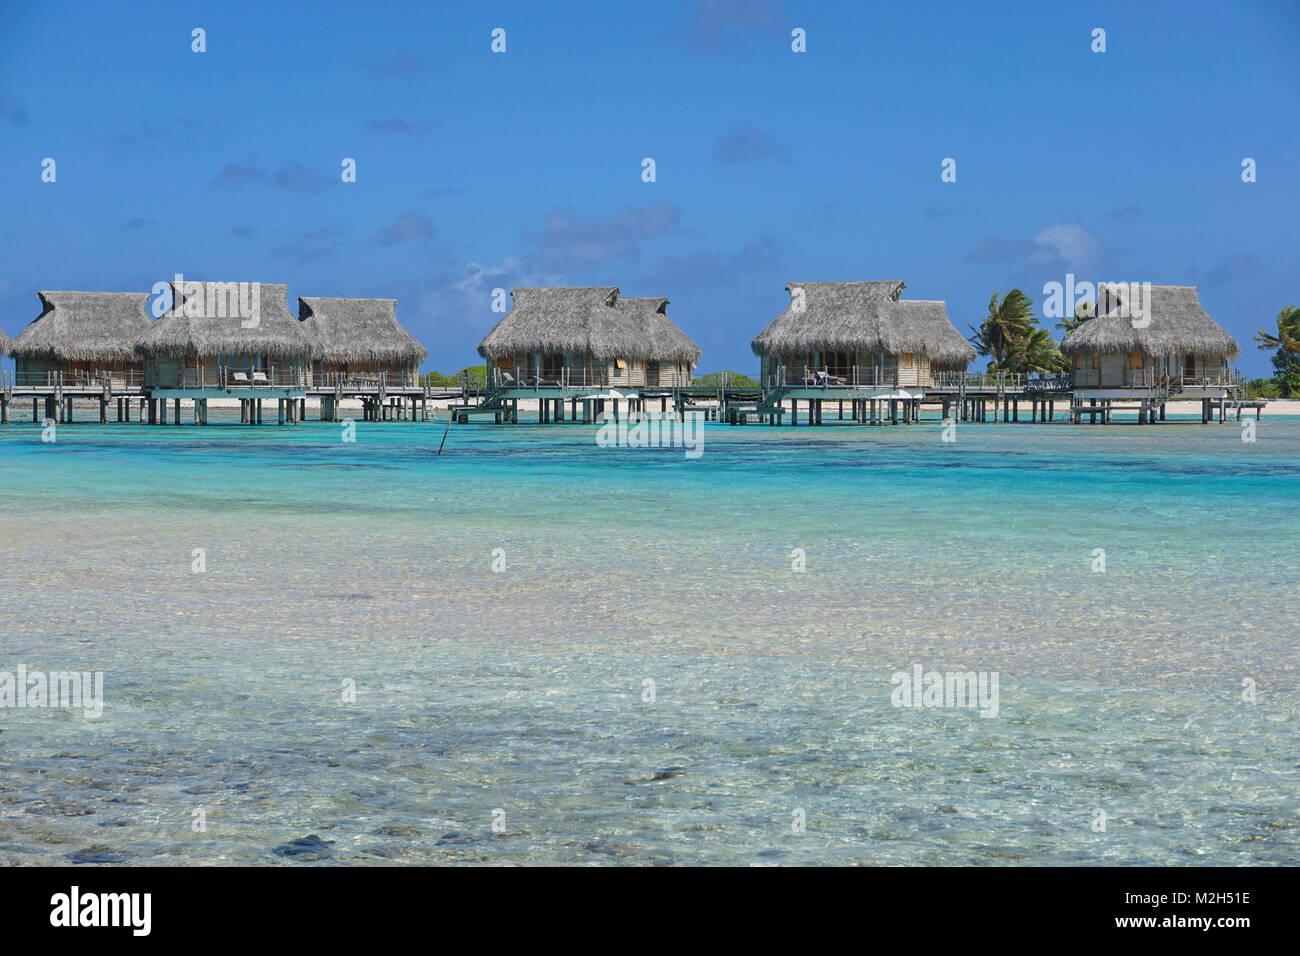 Tropical resort con bungalows sobre el agua en la laguna, Tikehau atoll, Tuamotus, Polinesia francesa, Océano Imagen De Stock